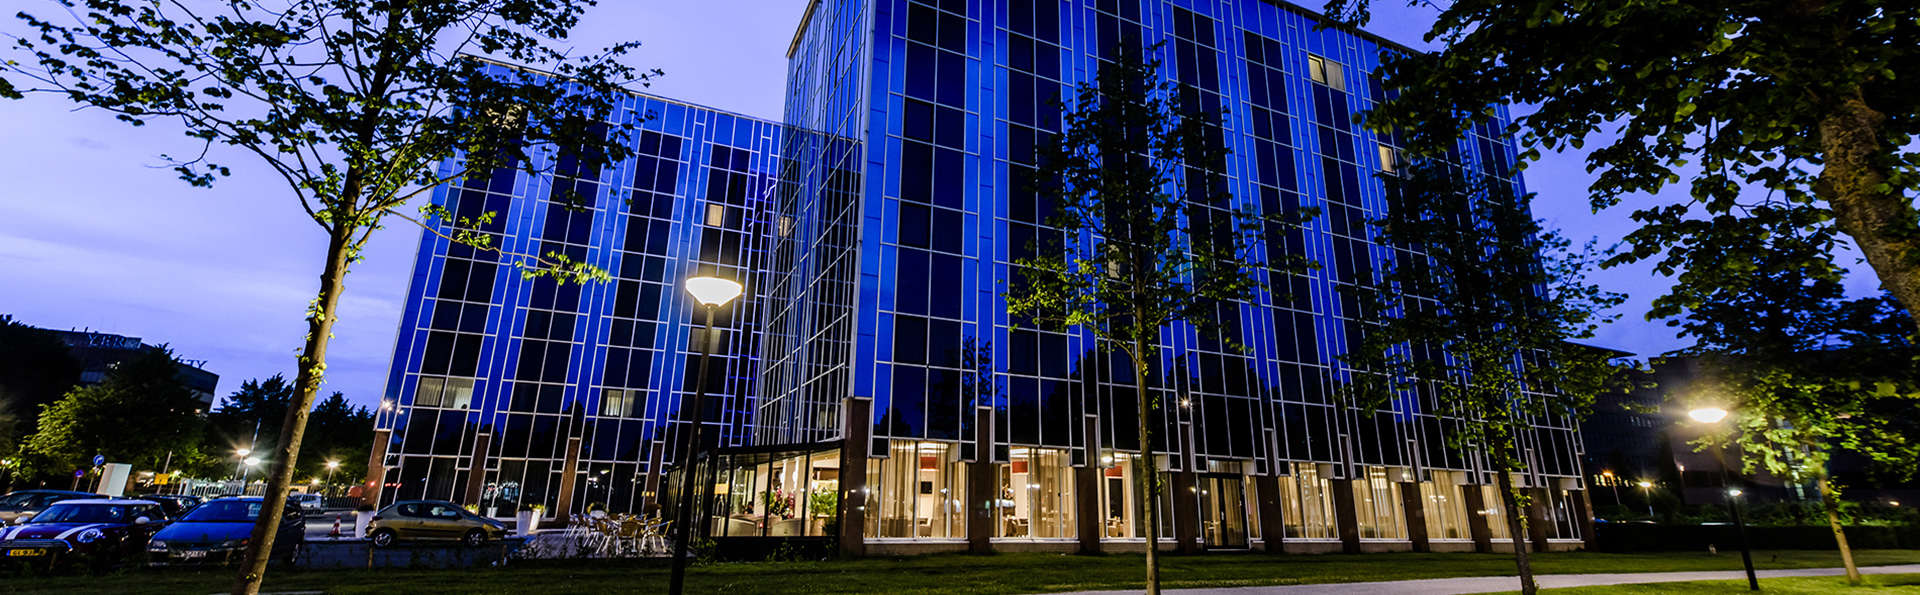 OZO Hotel Amsterdam - EDIT_Exterior.jpg